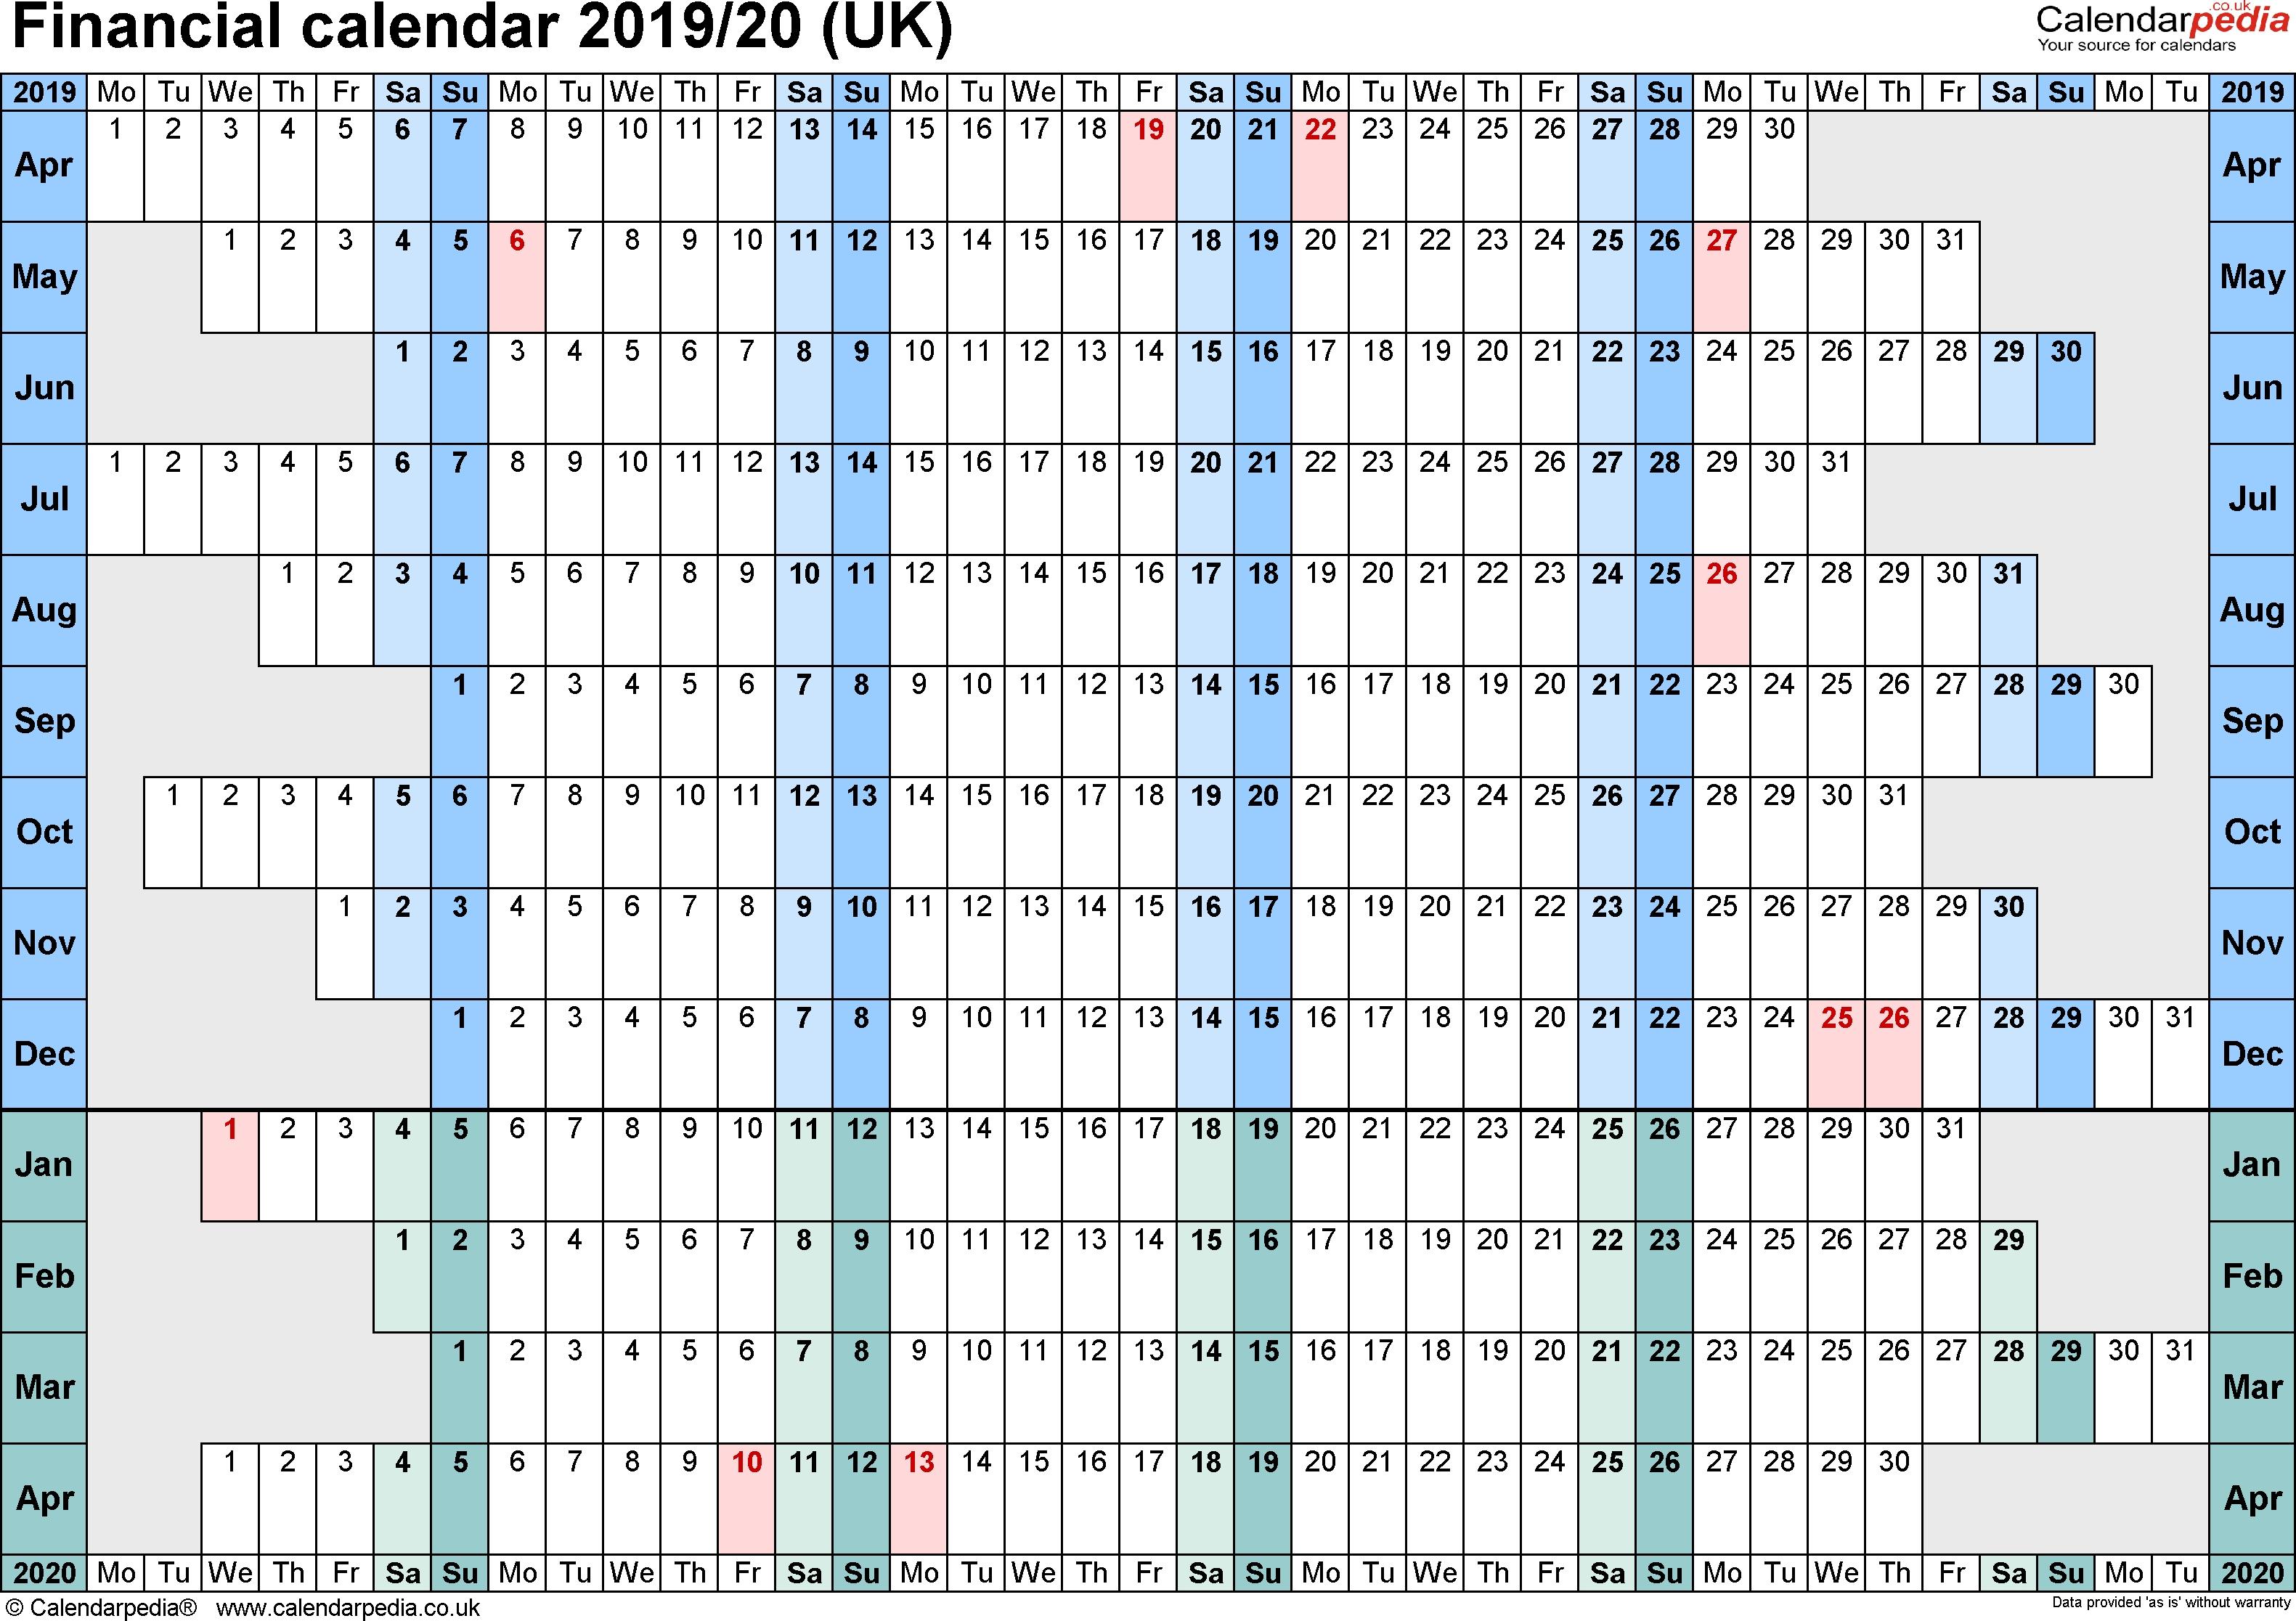 Financial Calendars 2019/20 (Uk) In Pdf Format within Hmrc Fortnightly Tax Calendar 2019 2020